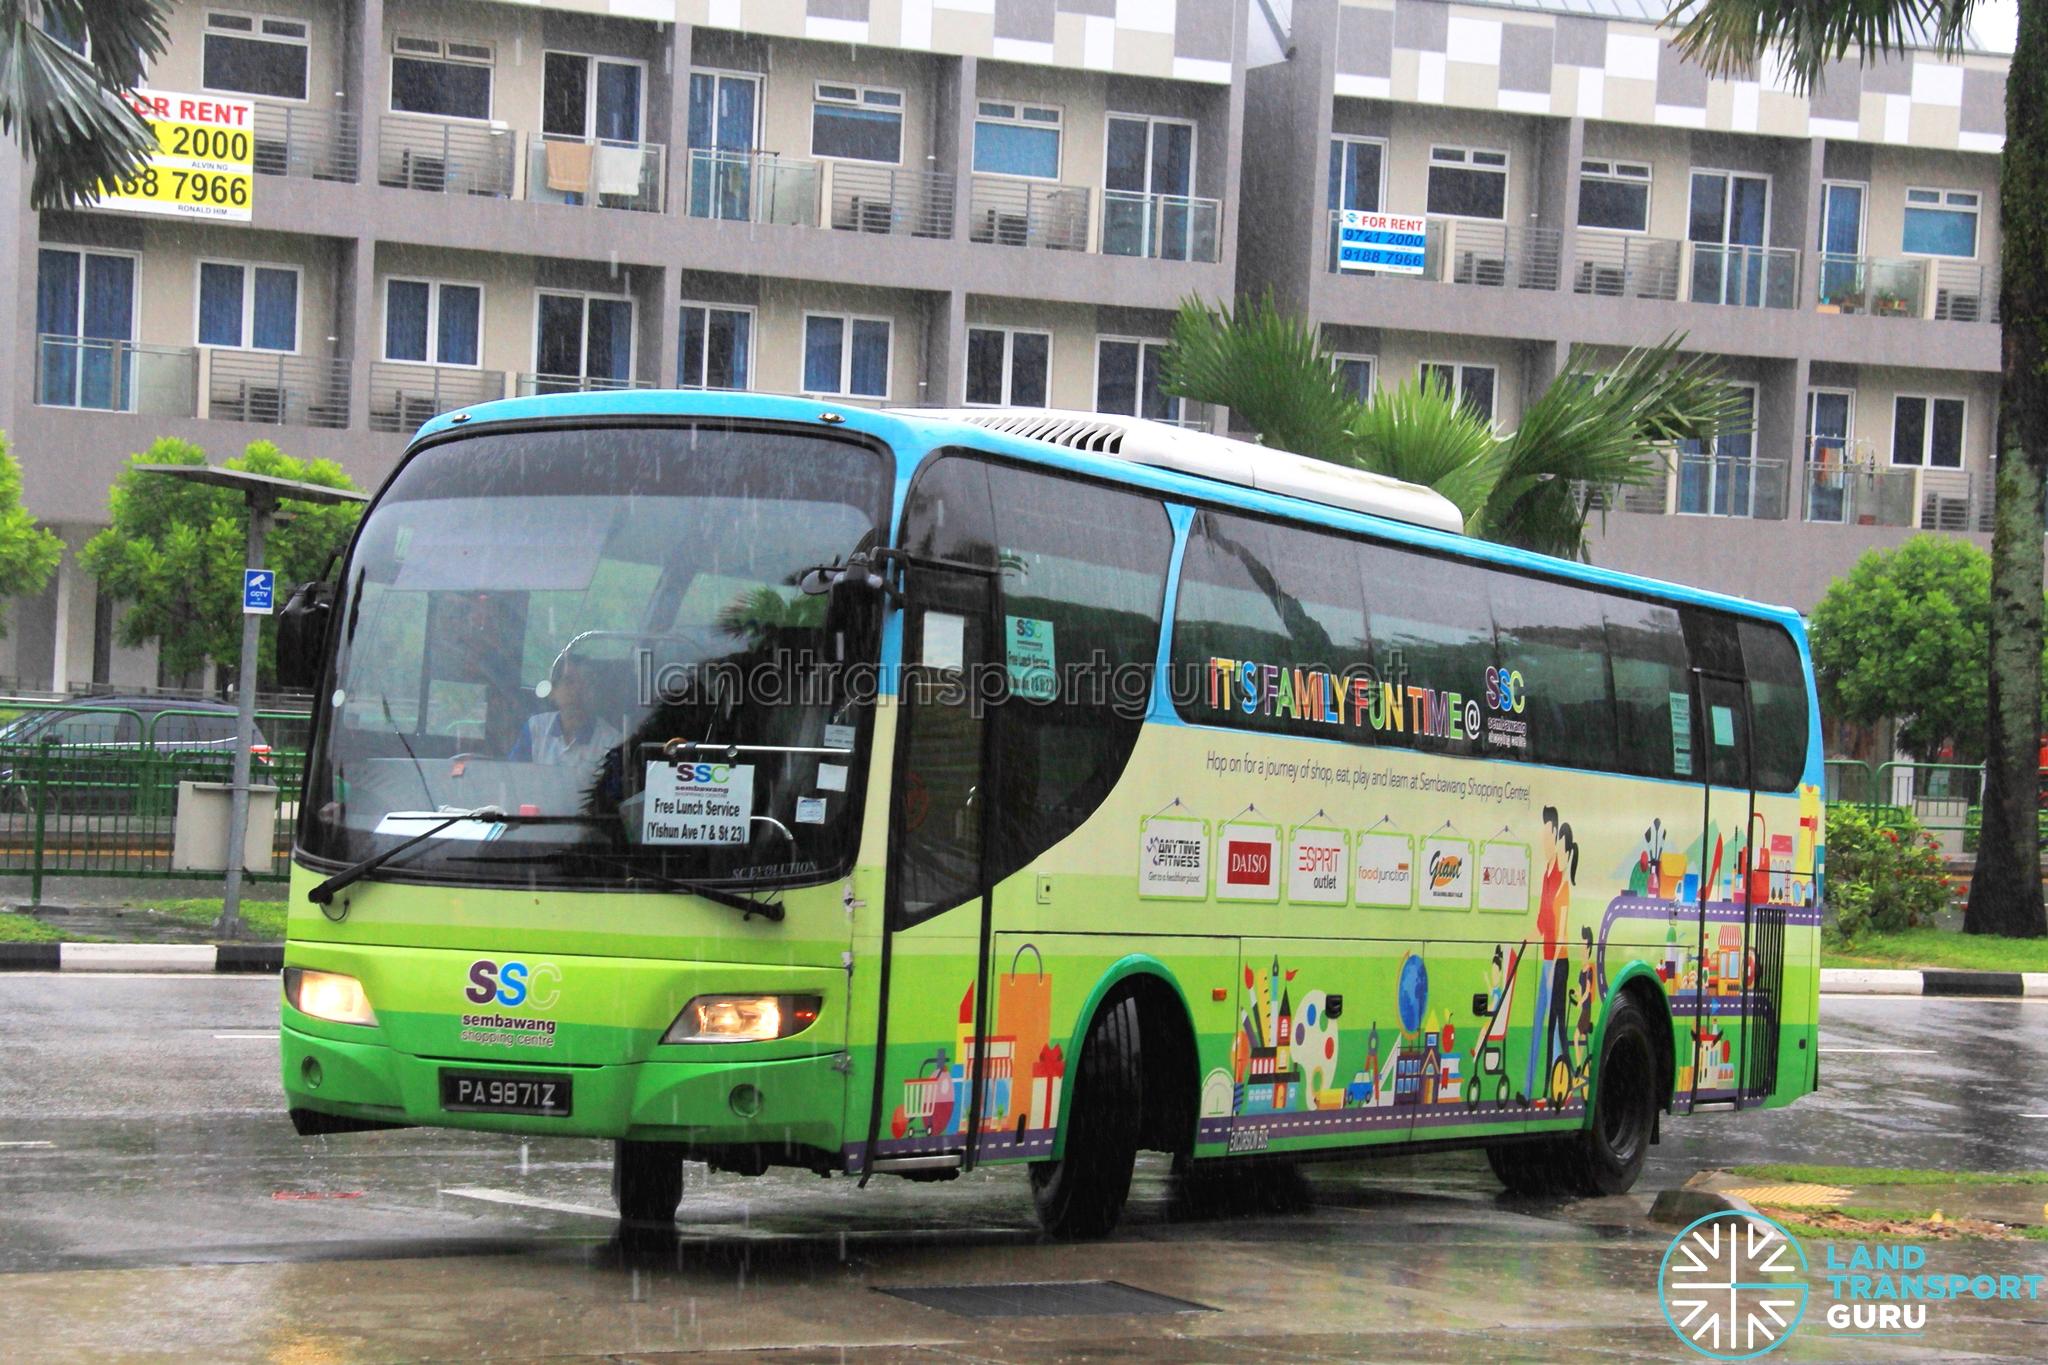 Sembawang Shopping Centre Shuttle Bus Services | Land Transport Guru